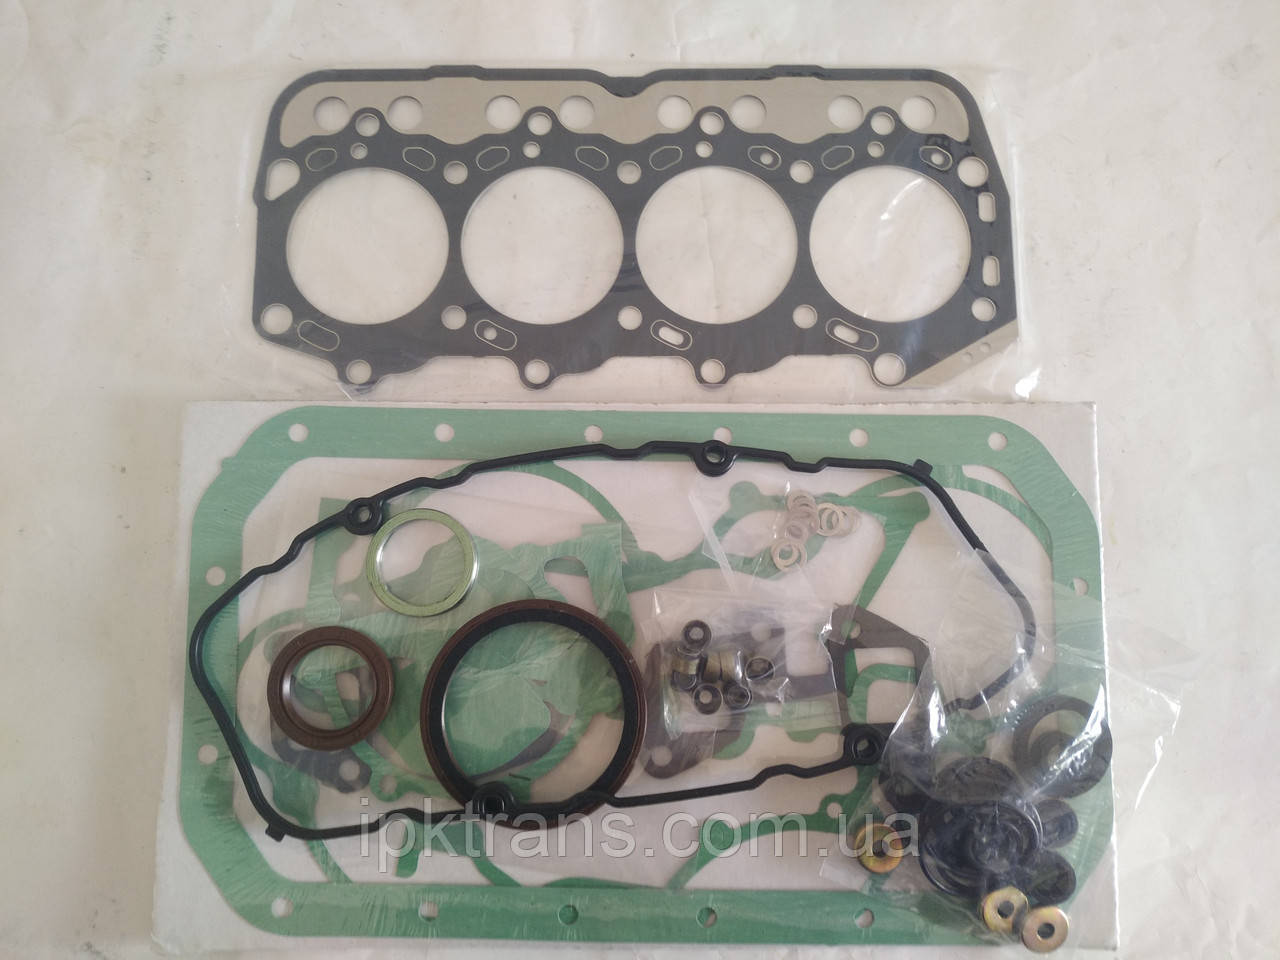 Набор прокладок двигателя TOYOTA 1DZ2  Железо (2340 грн)  04111-20321-71 / 041112032171